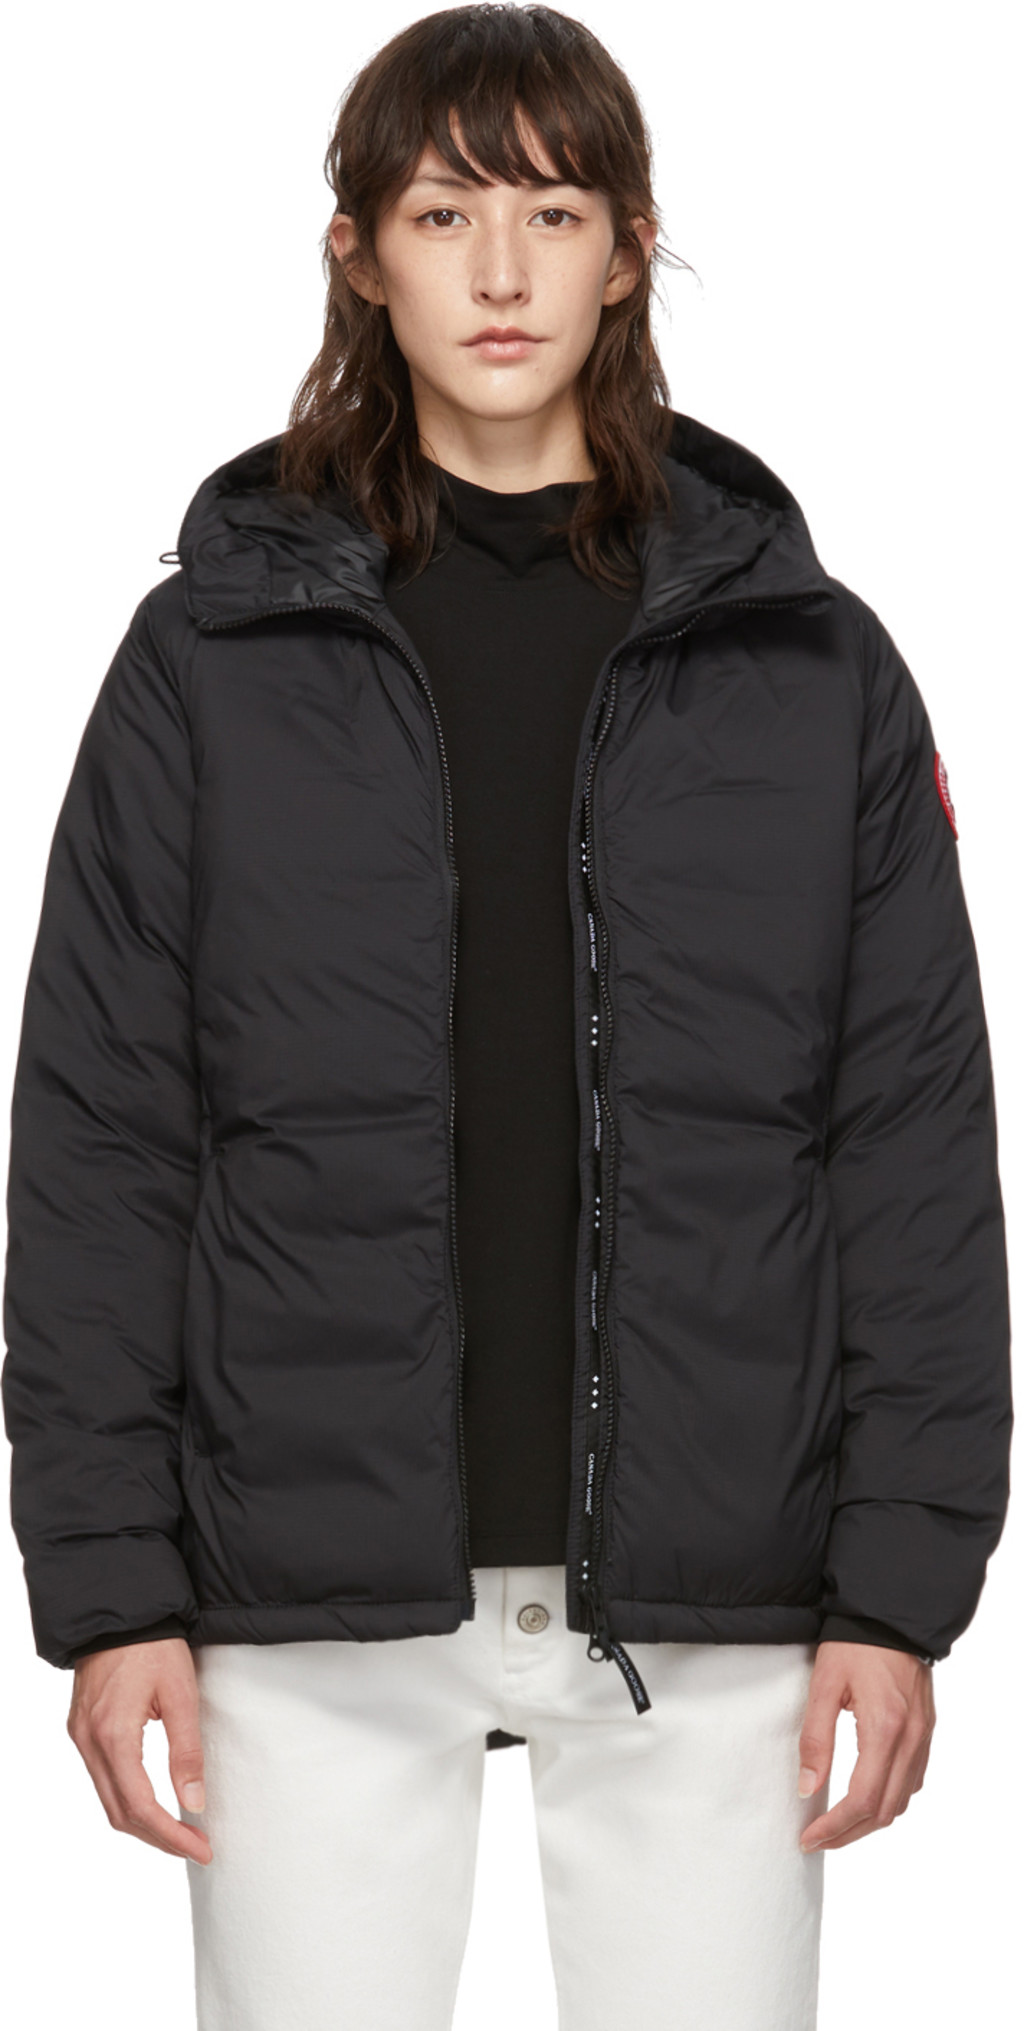 cc0771257bb Black Camp Hoody Jacket